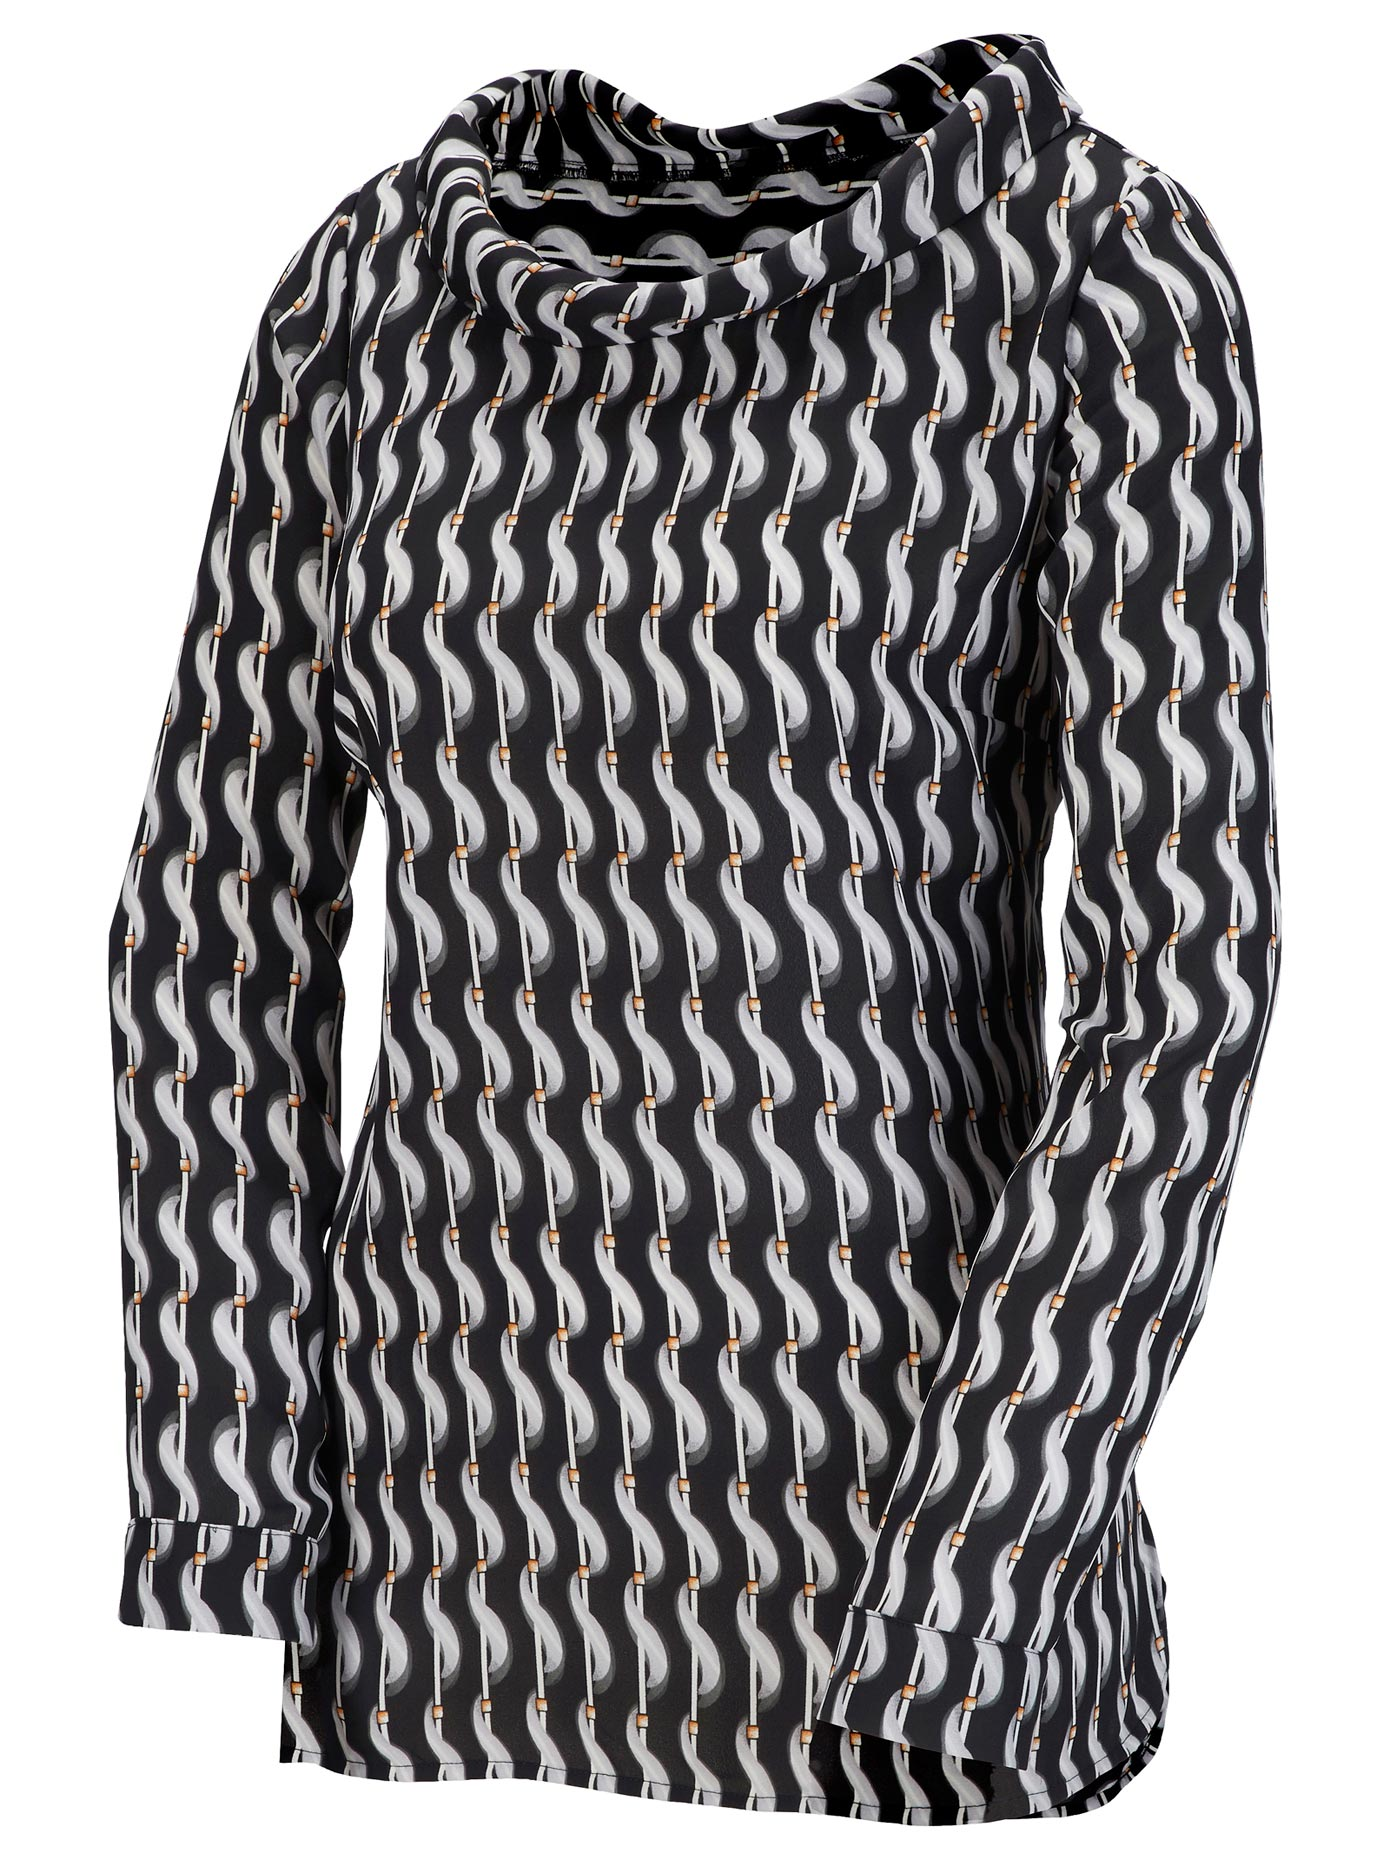 création L Bluse mit überlappendem Rückenteil